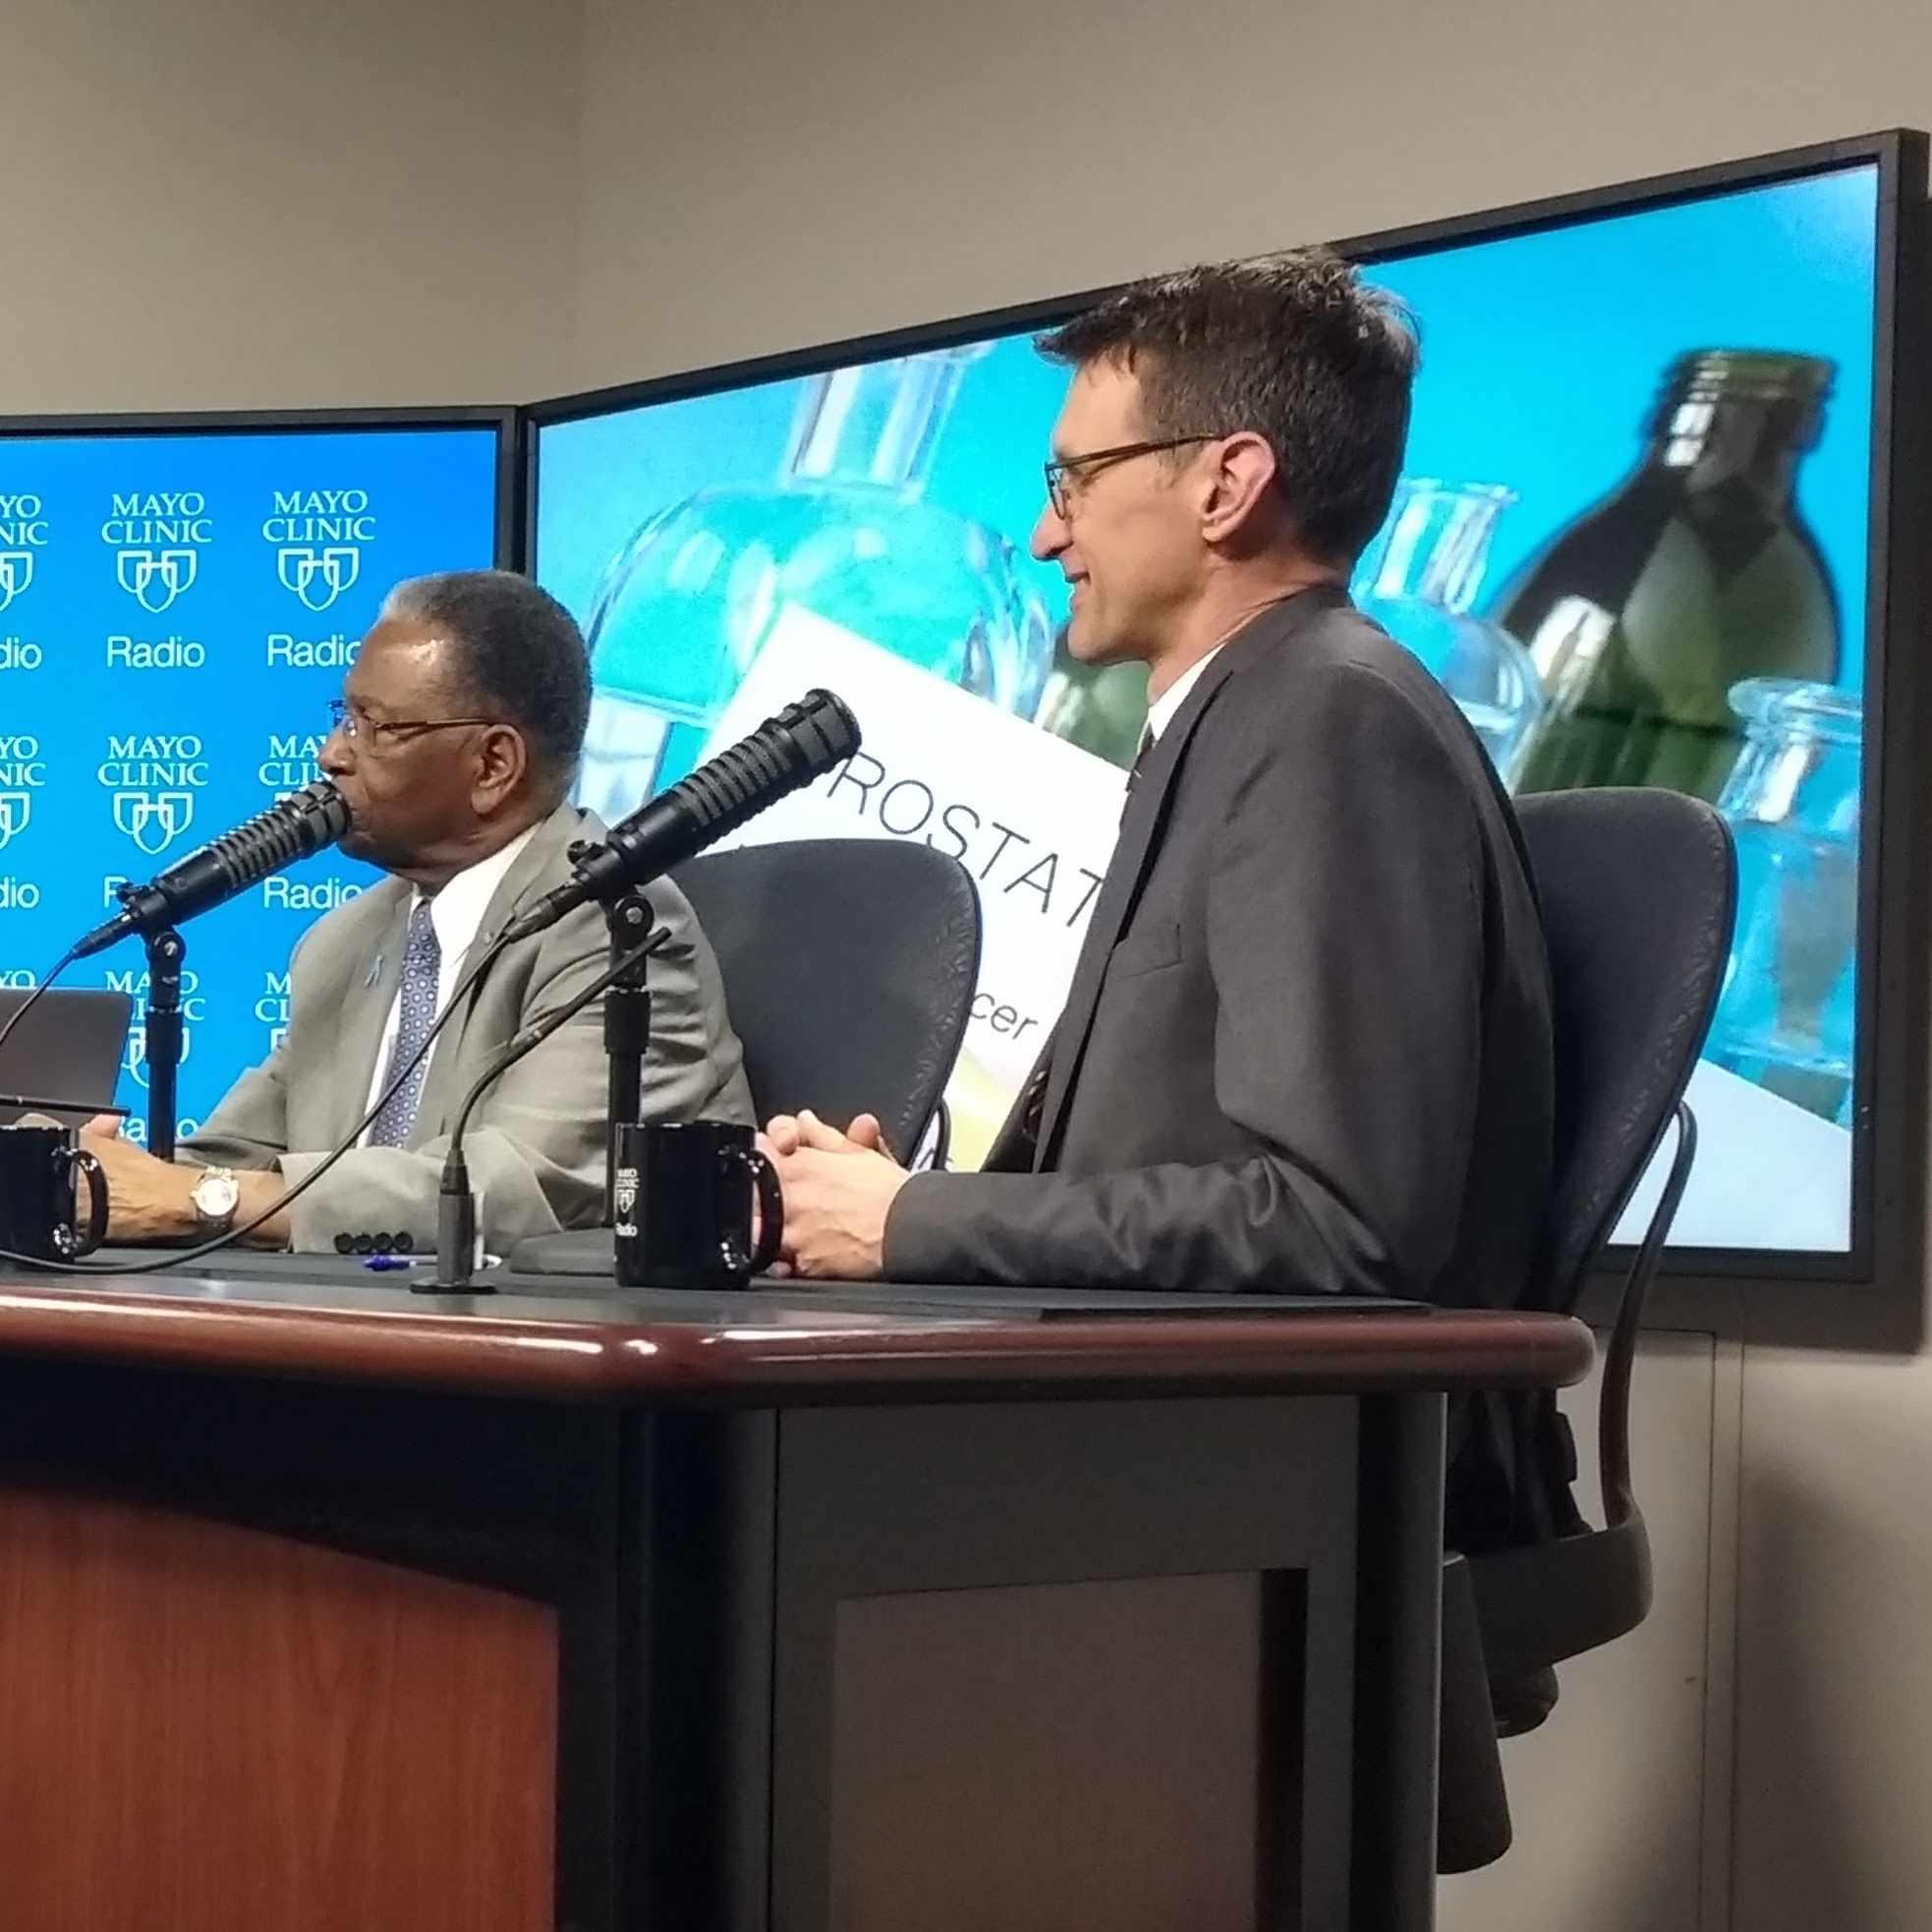 Dr. Jon Tilburt and Ret. Col. Jim Williams being interviewed on Mayo Clinic Radio